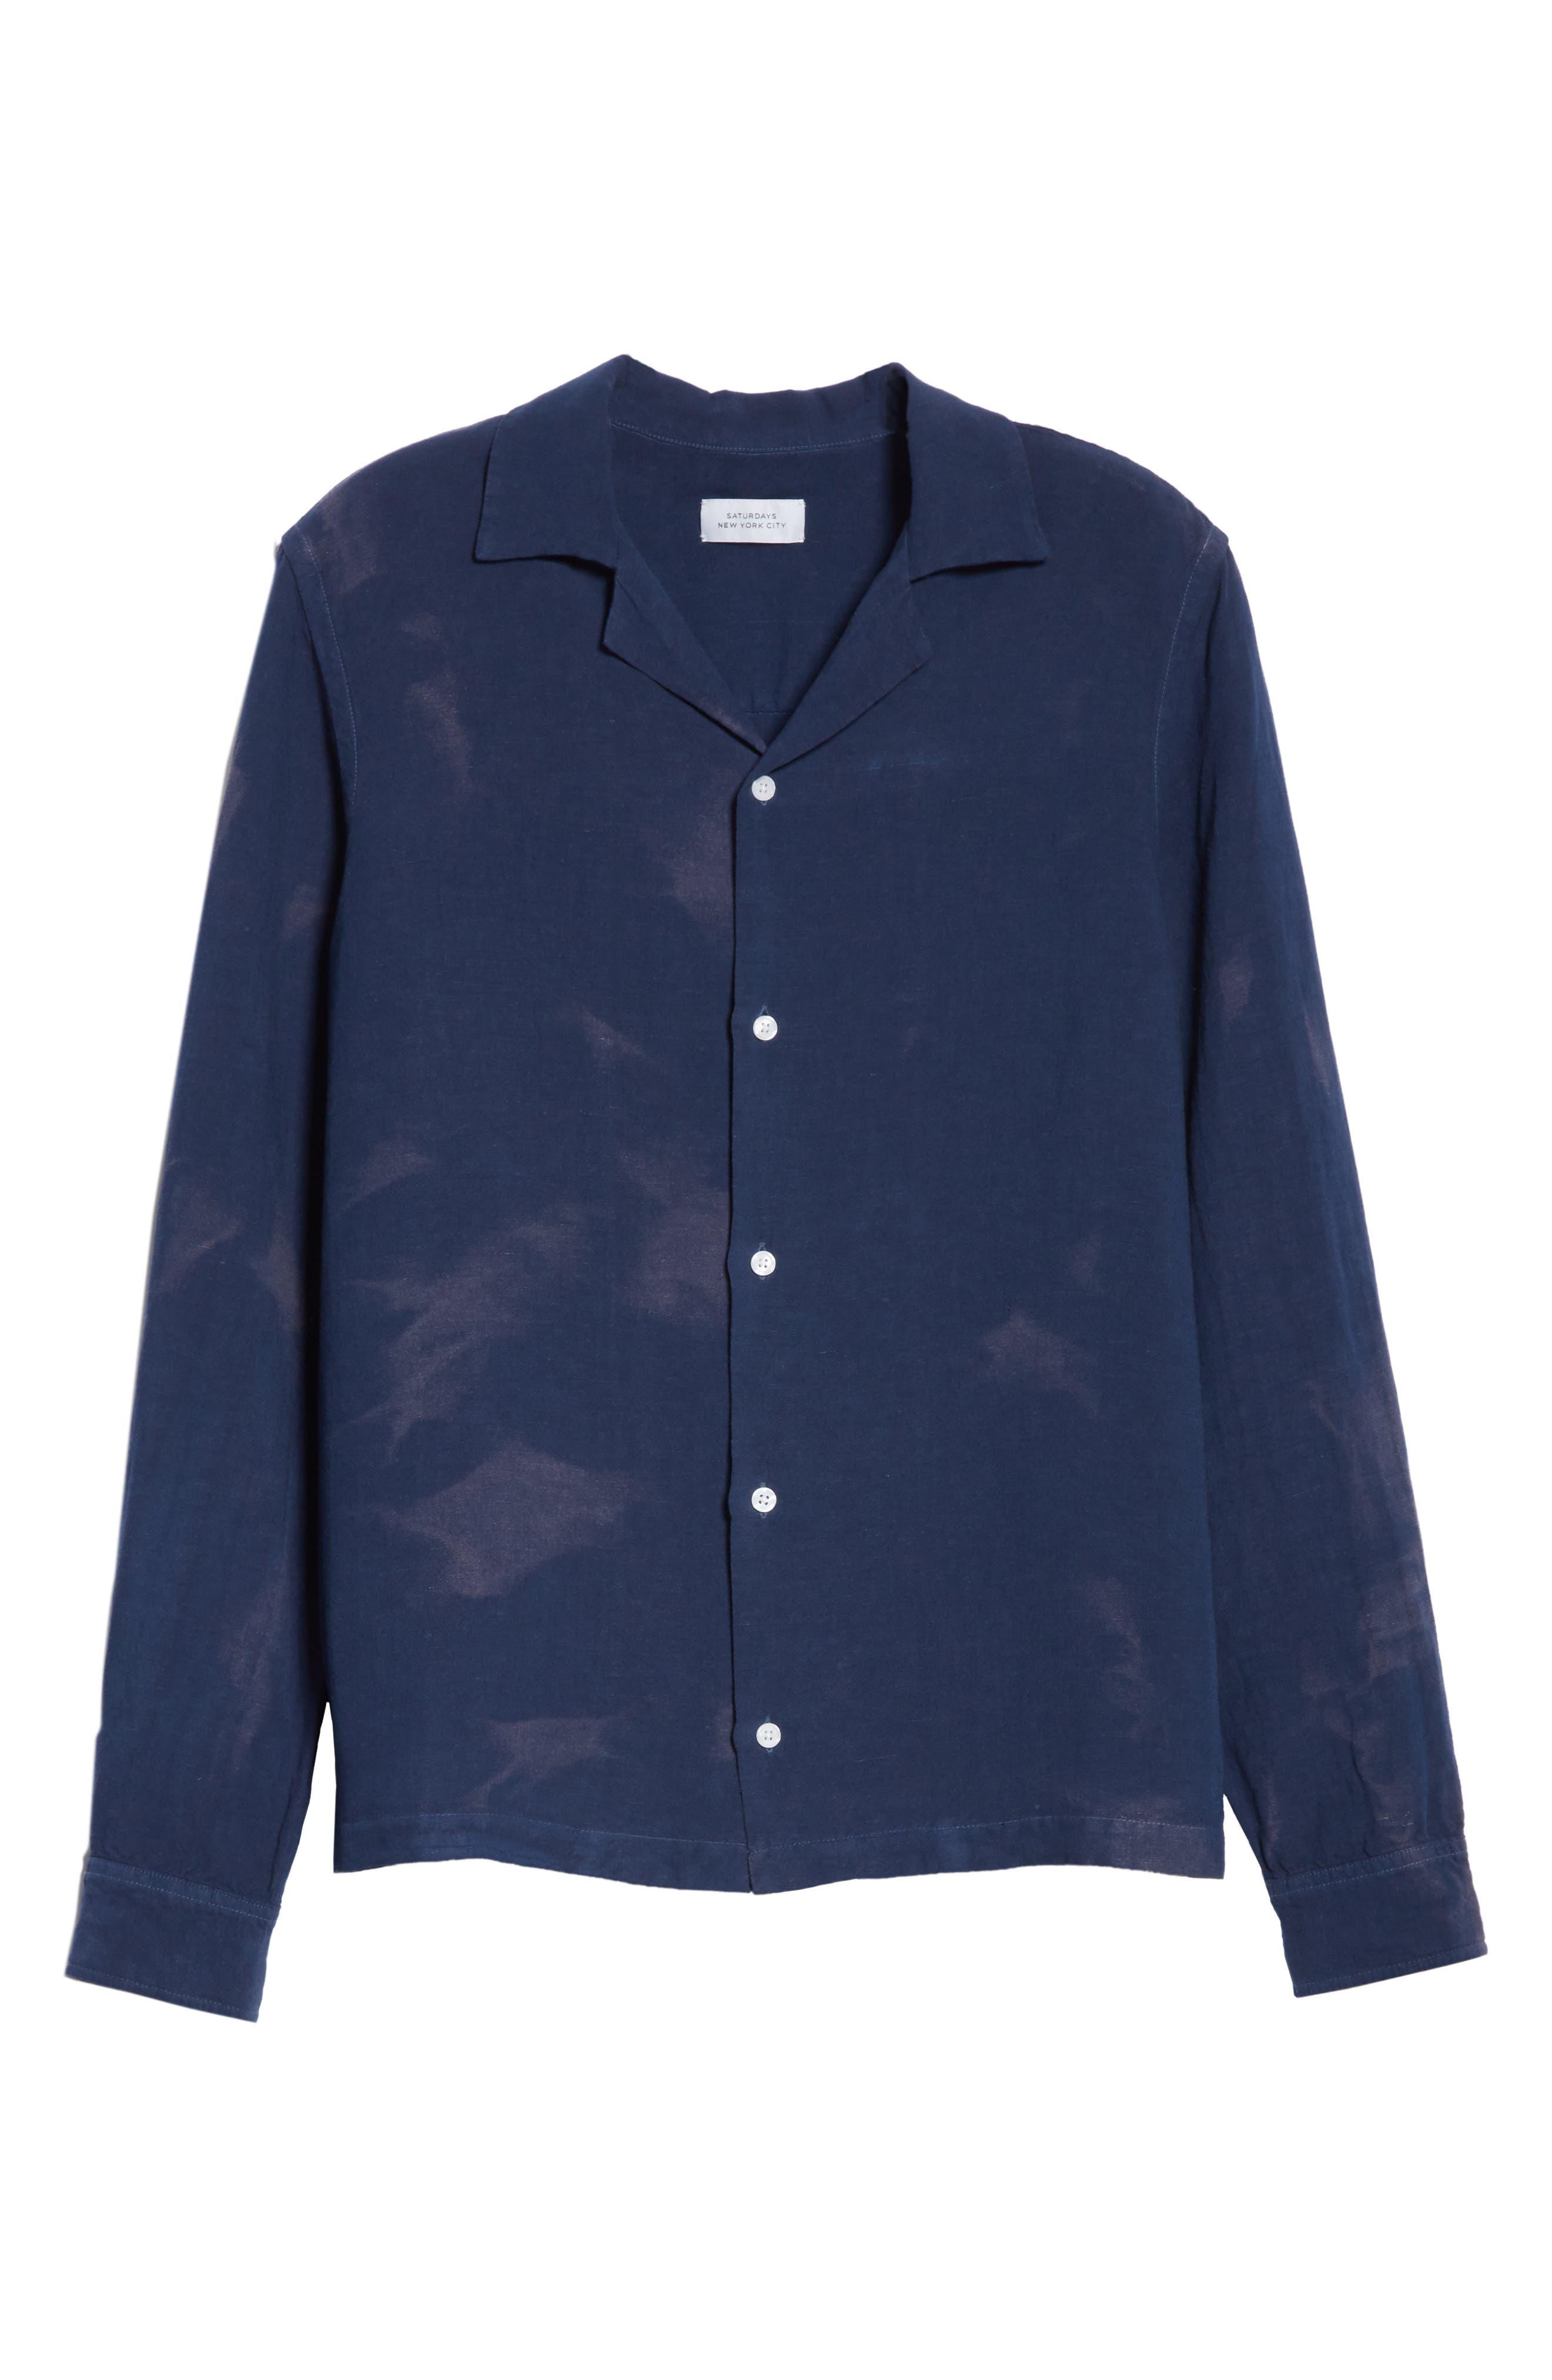 Canty Long Sleeve Camp Shirt,                             Alternate thumbnail 6, color,                             406